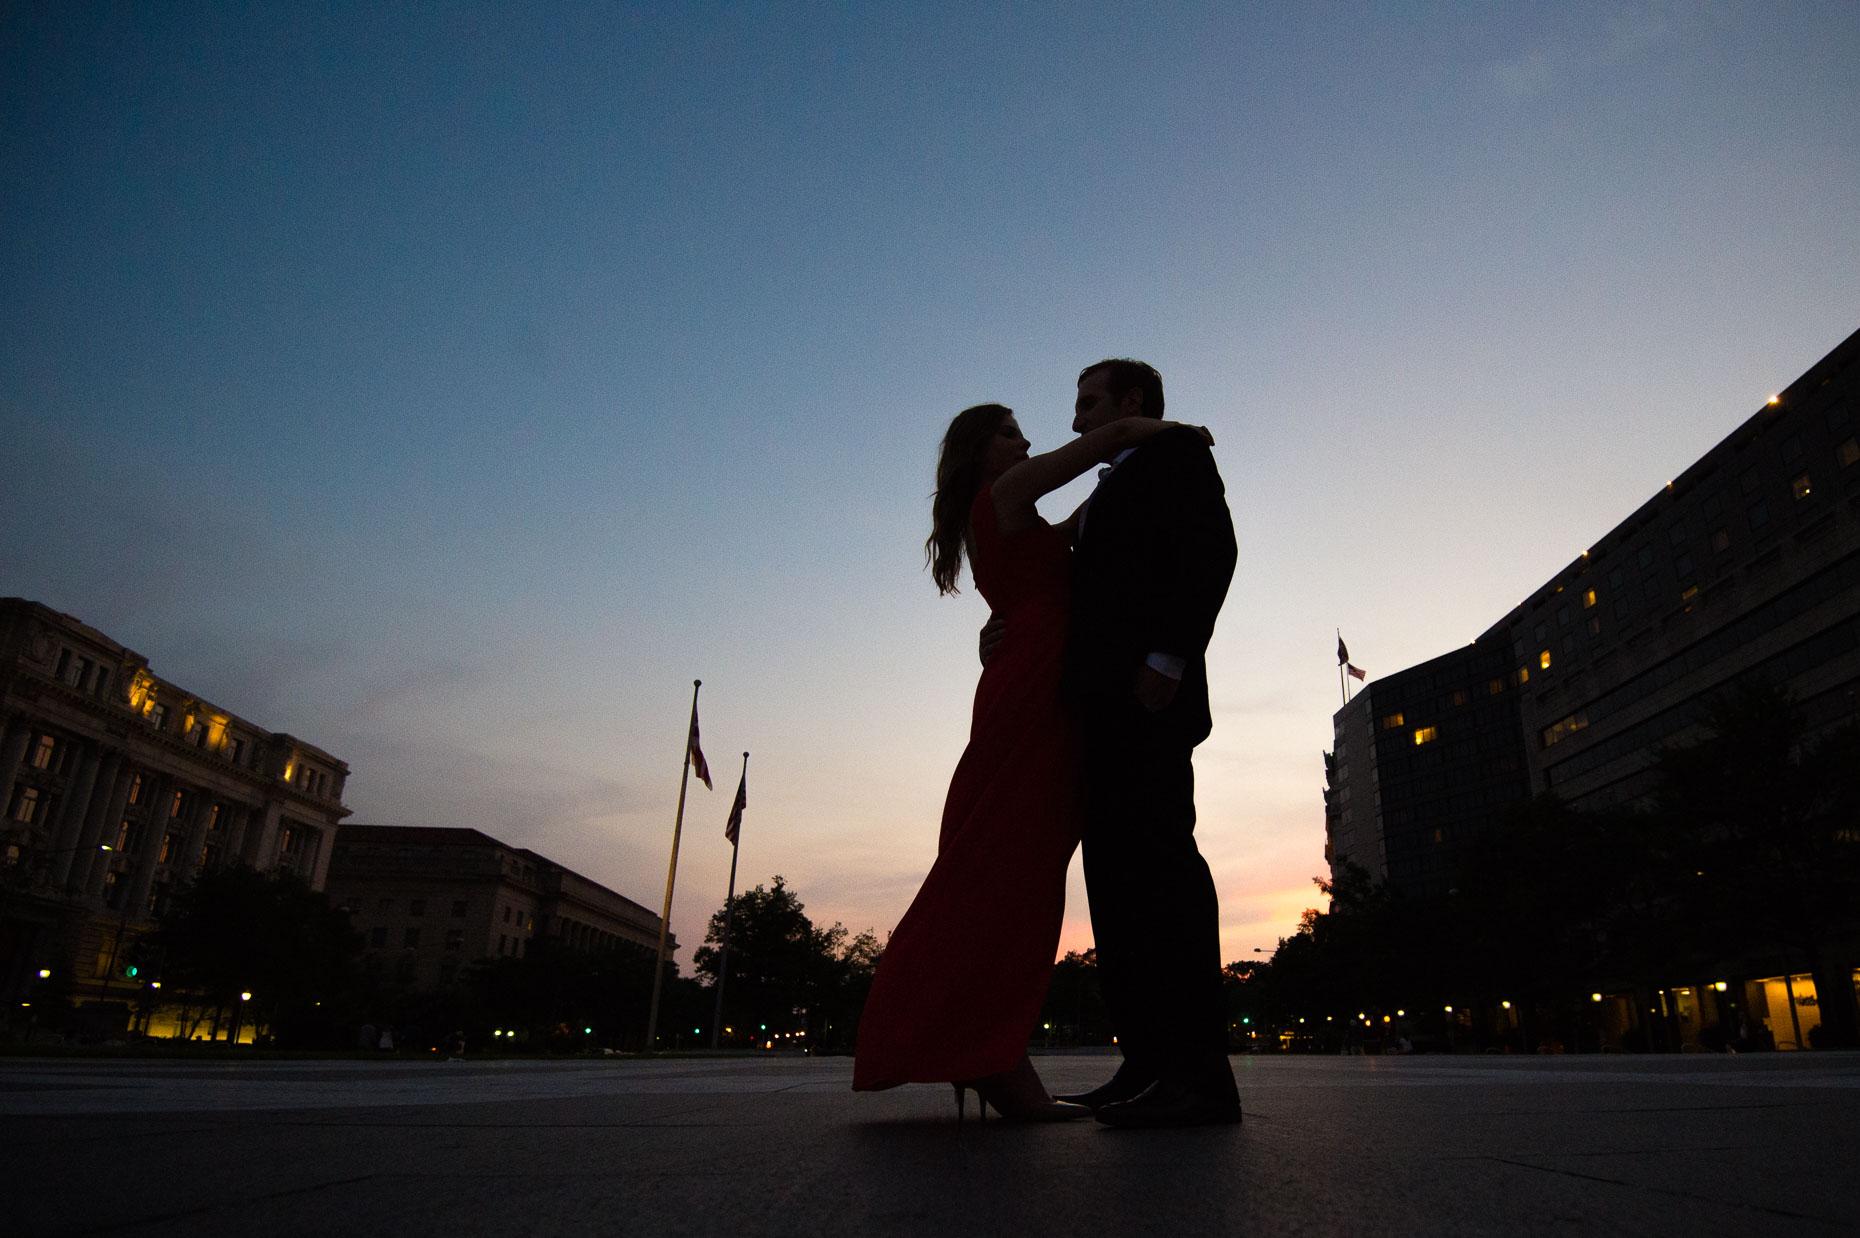 Weddings by Elliott O'Donovan - Washington DC Engagement_-9.jpg